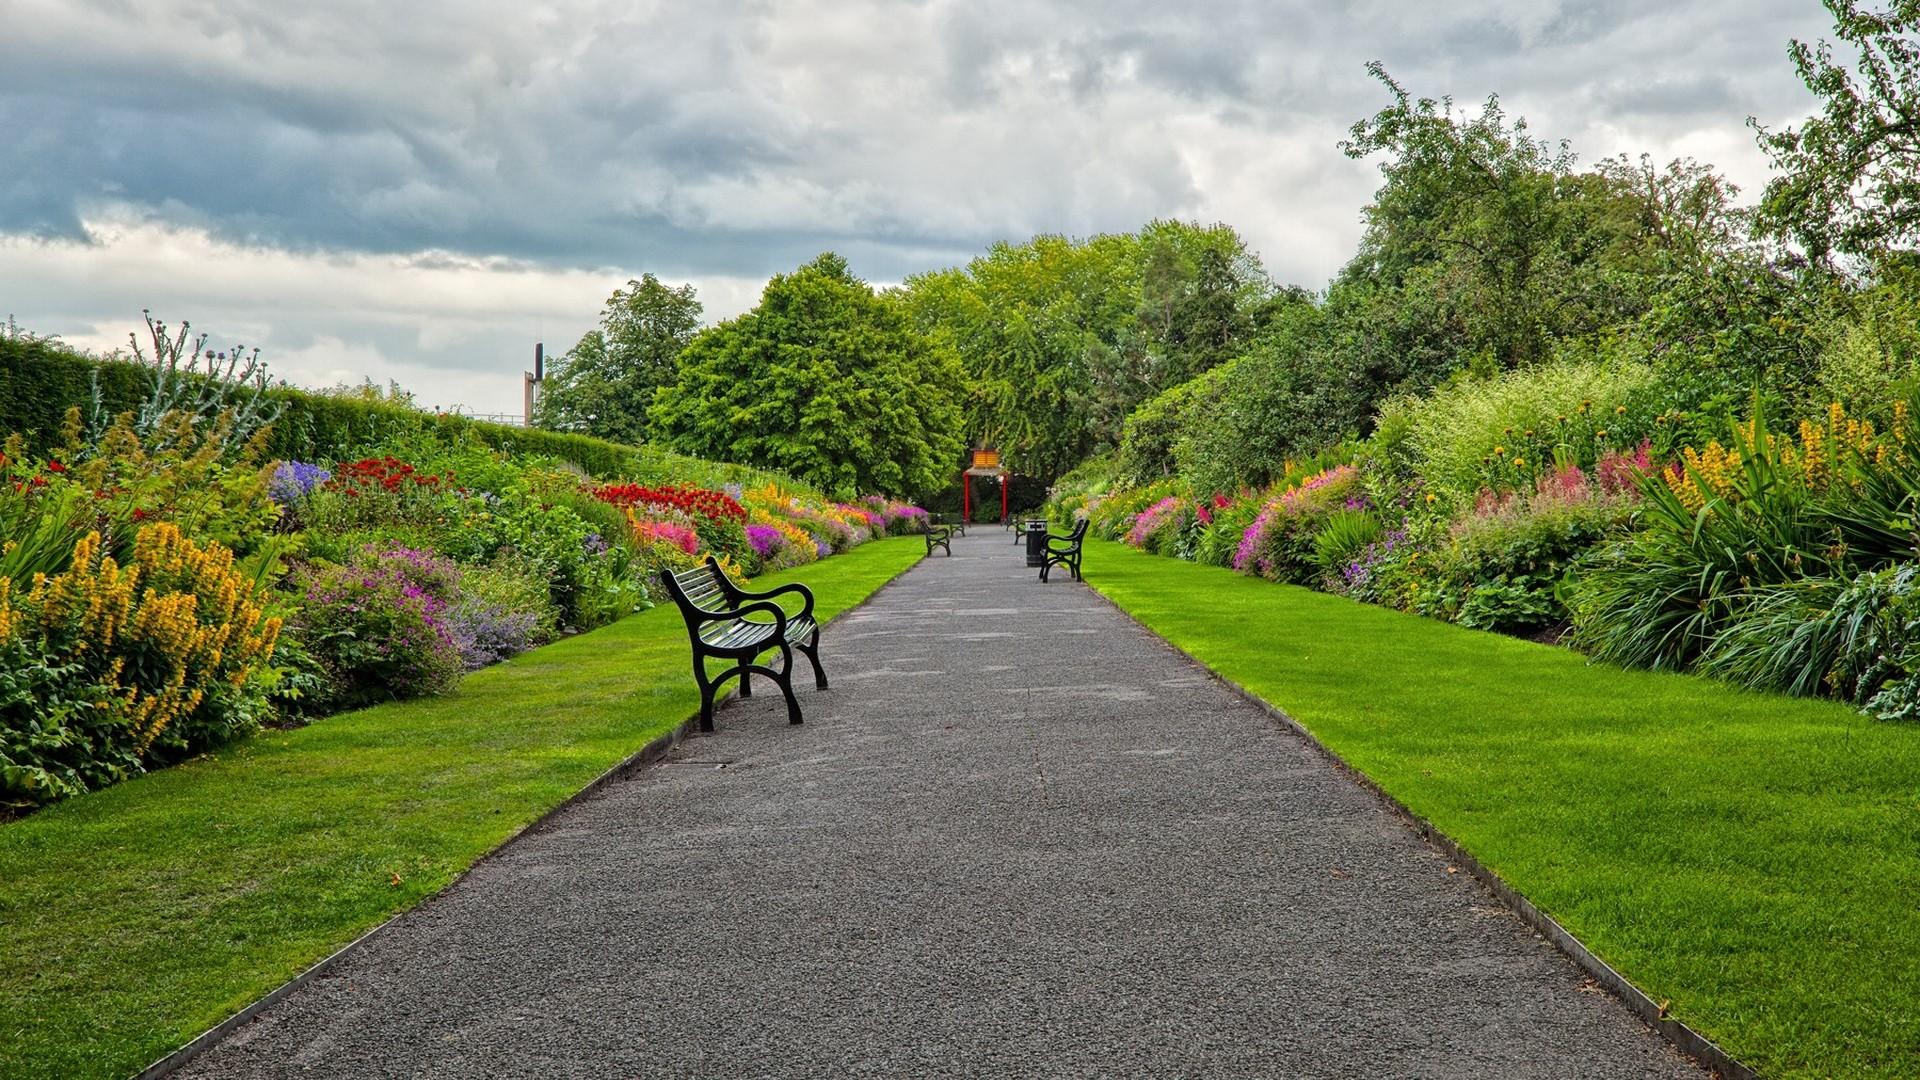 Flower garden background for How to landscape a garden